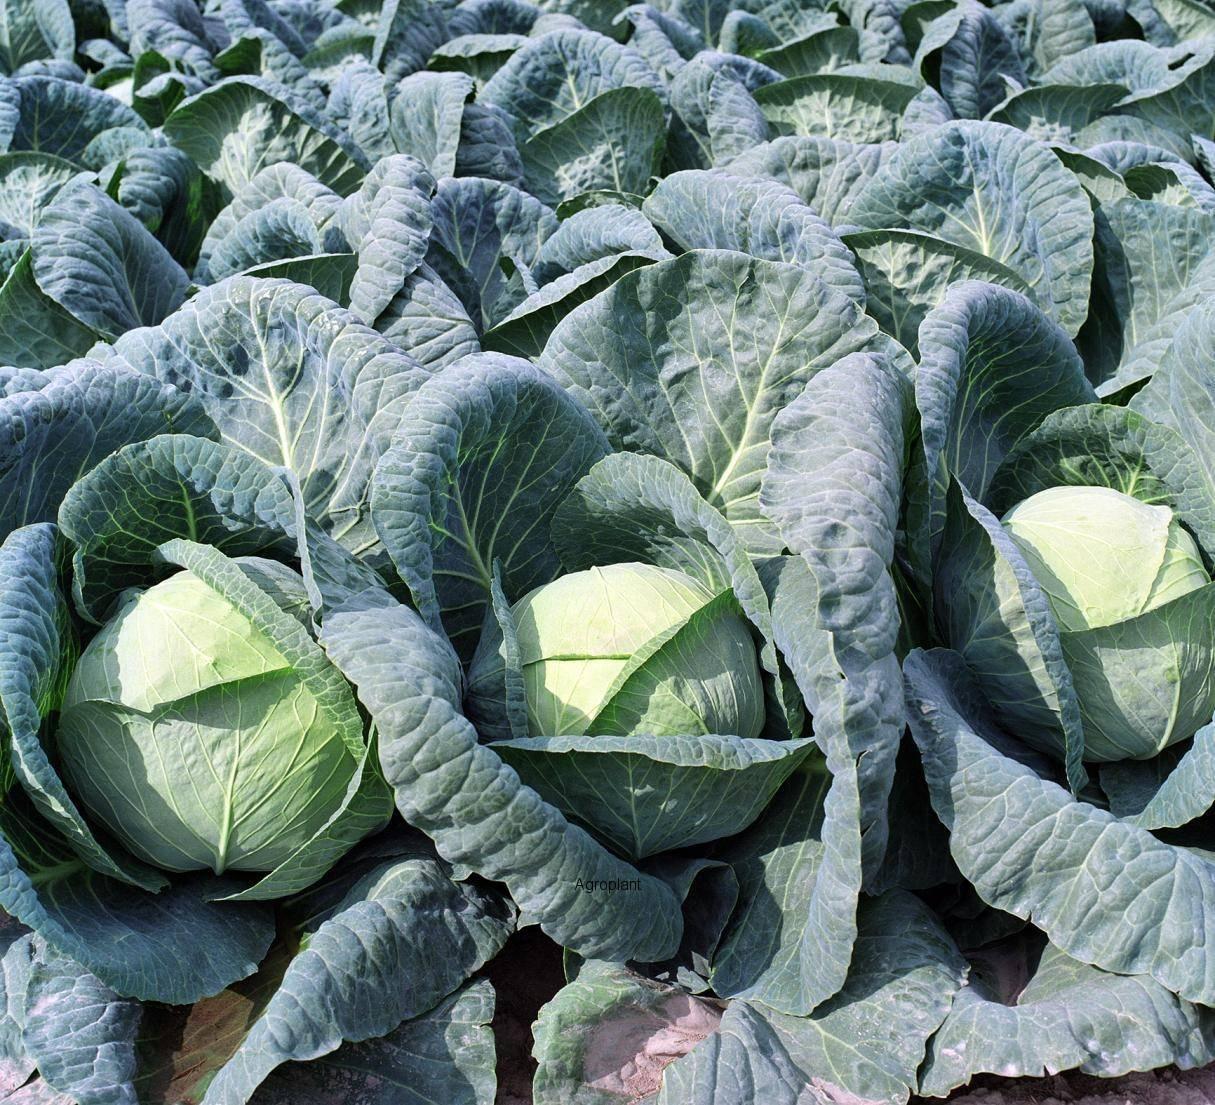 Характеристика капусты сорта крауткайзер - агро журнал dachnye-fei.ru